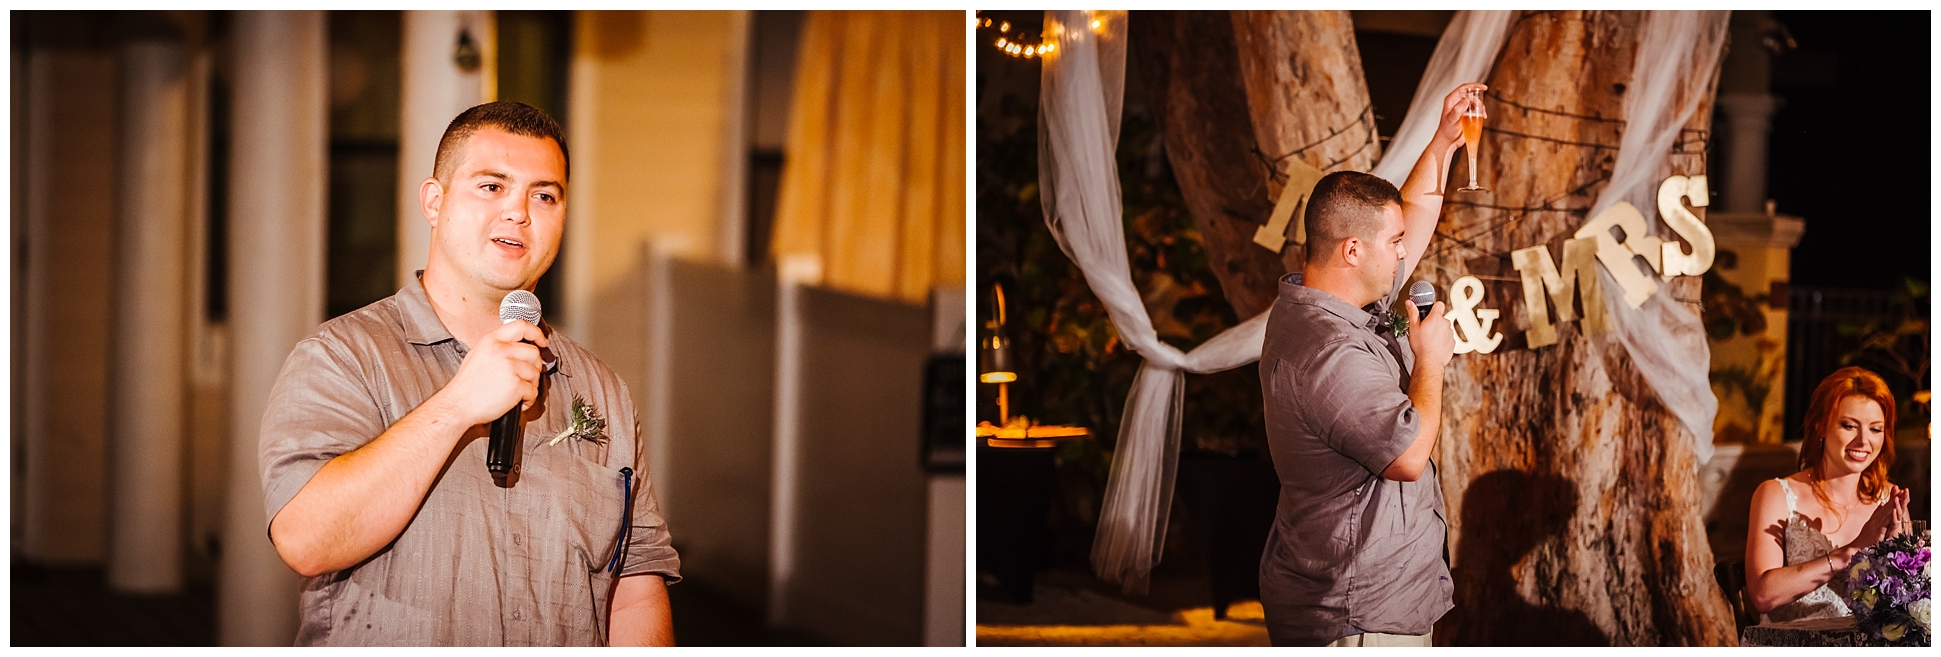 tampa-st-pete-wedding-photographer-indian-rocks-beach-mermaid-train-redhead_0175.jpg